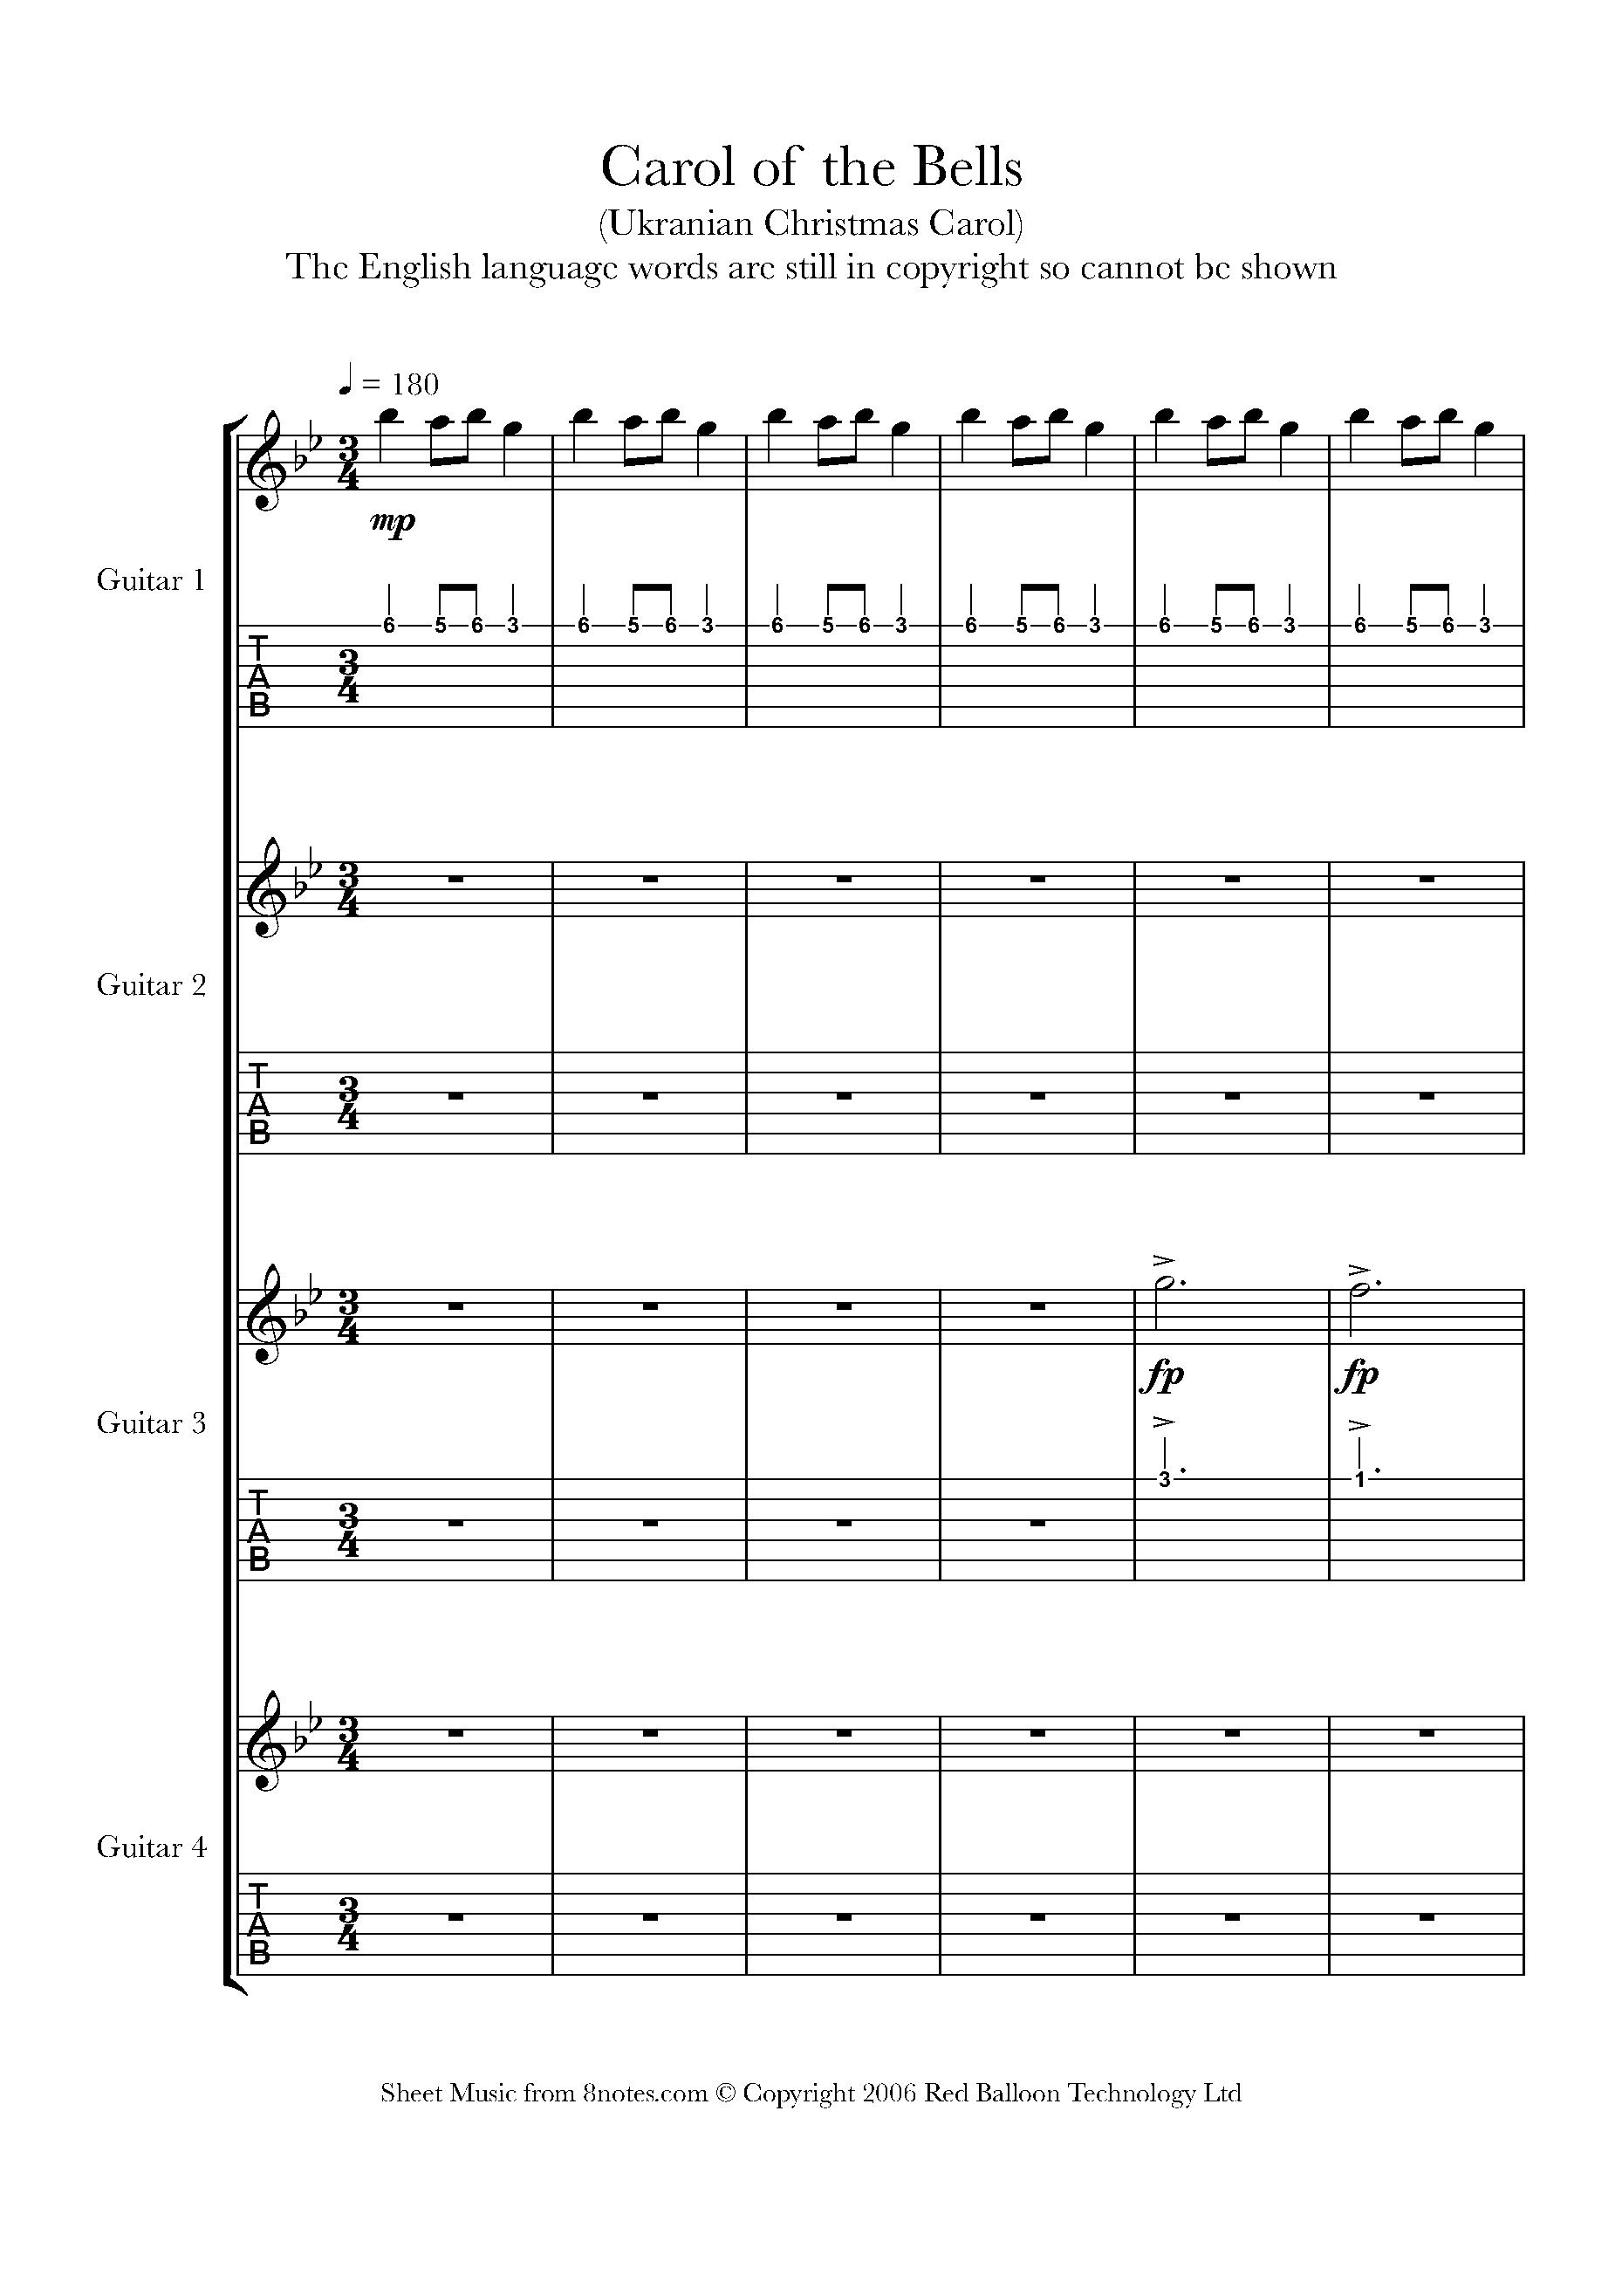 Carol of the Bells Sheet music for Guitar Ensemble   15notes.com